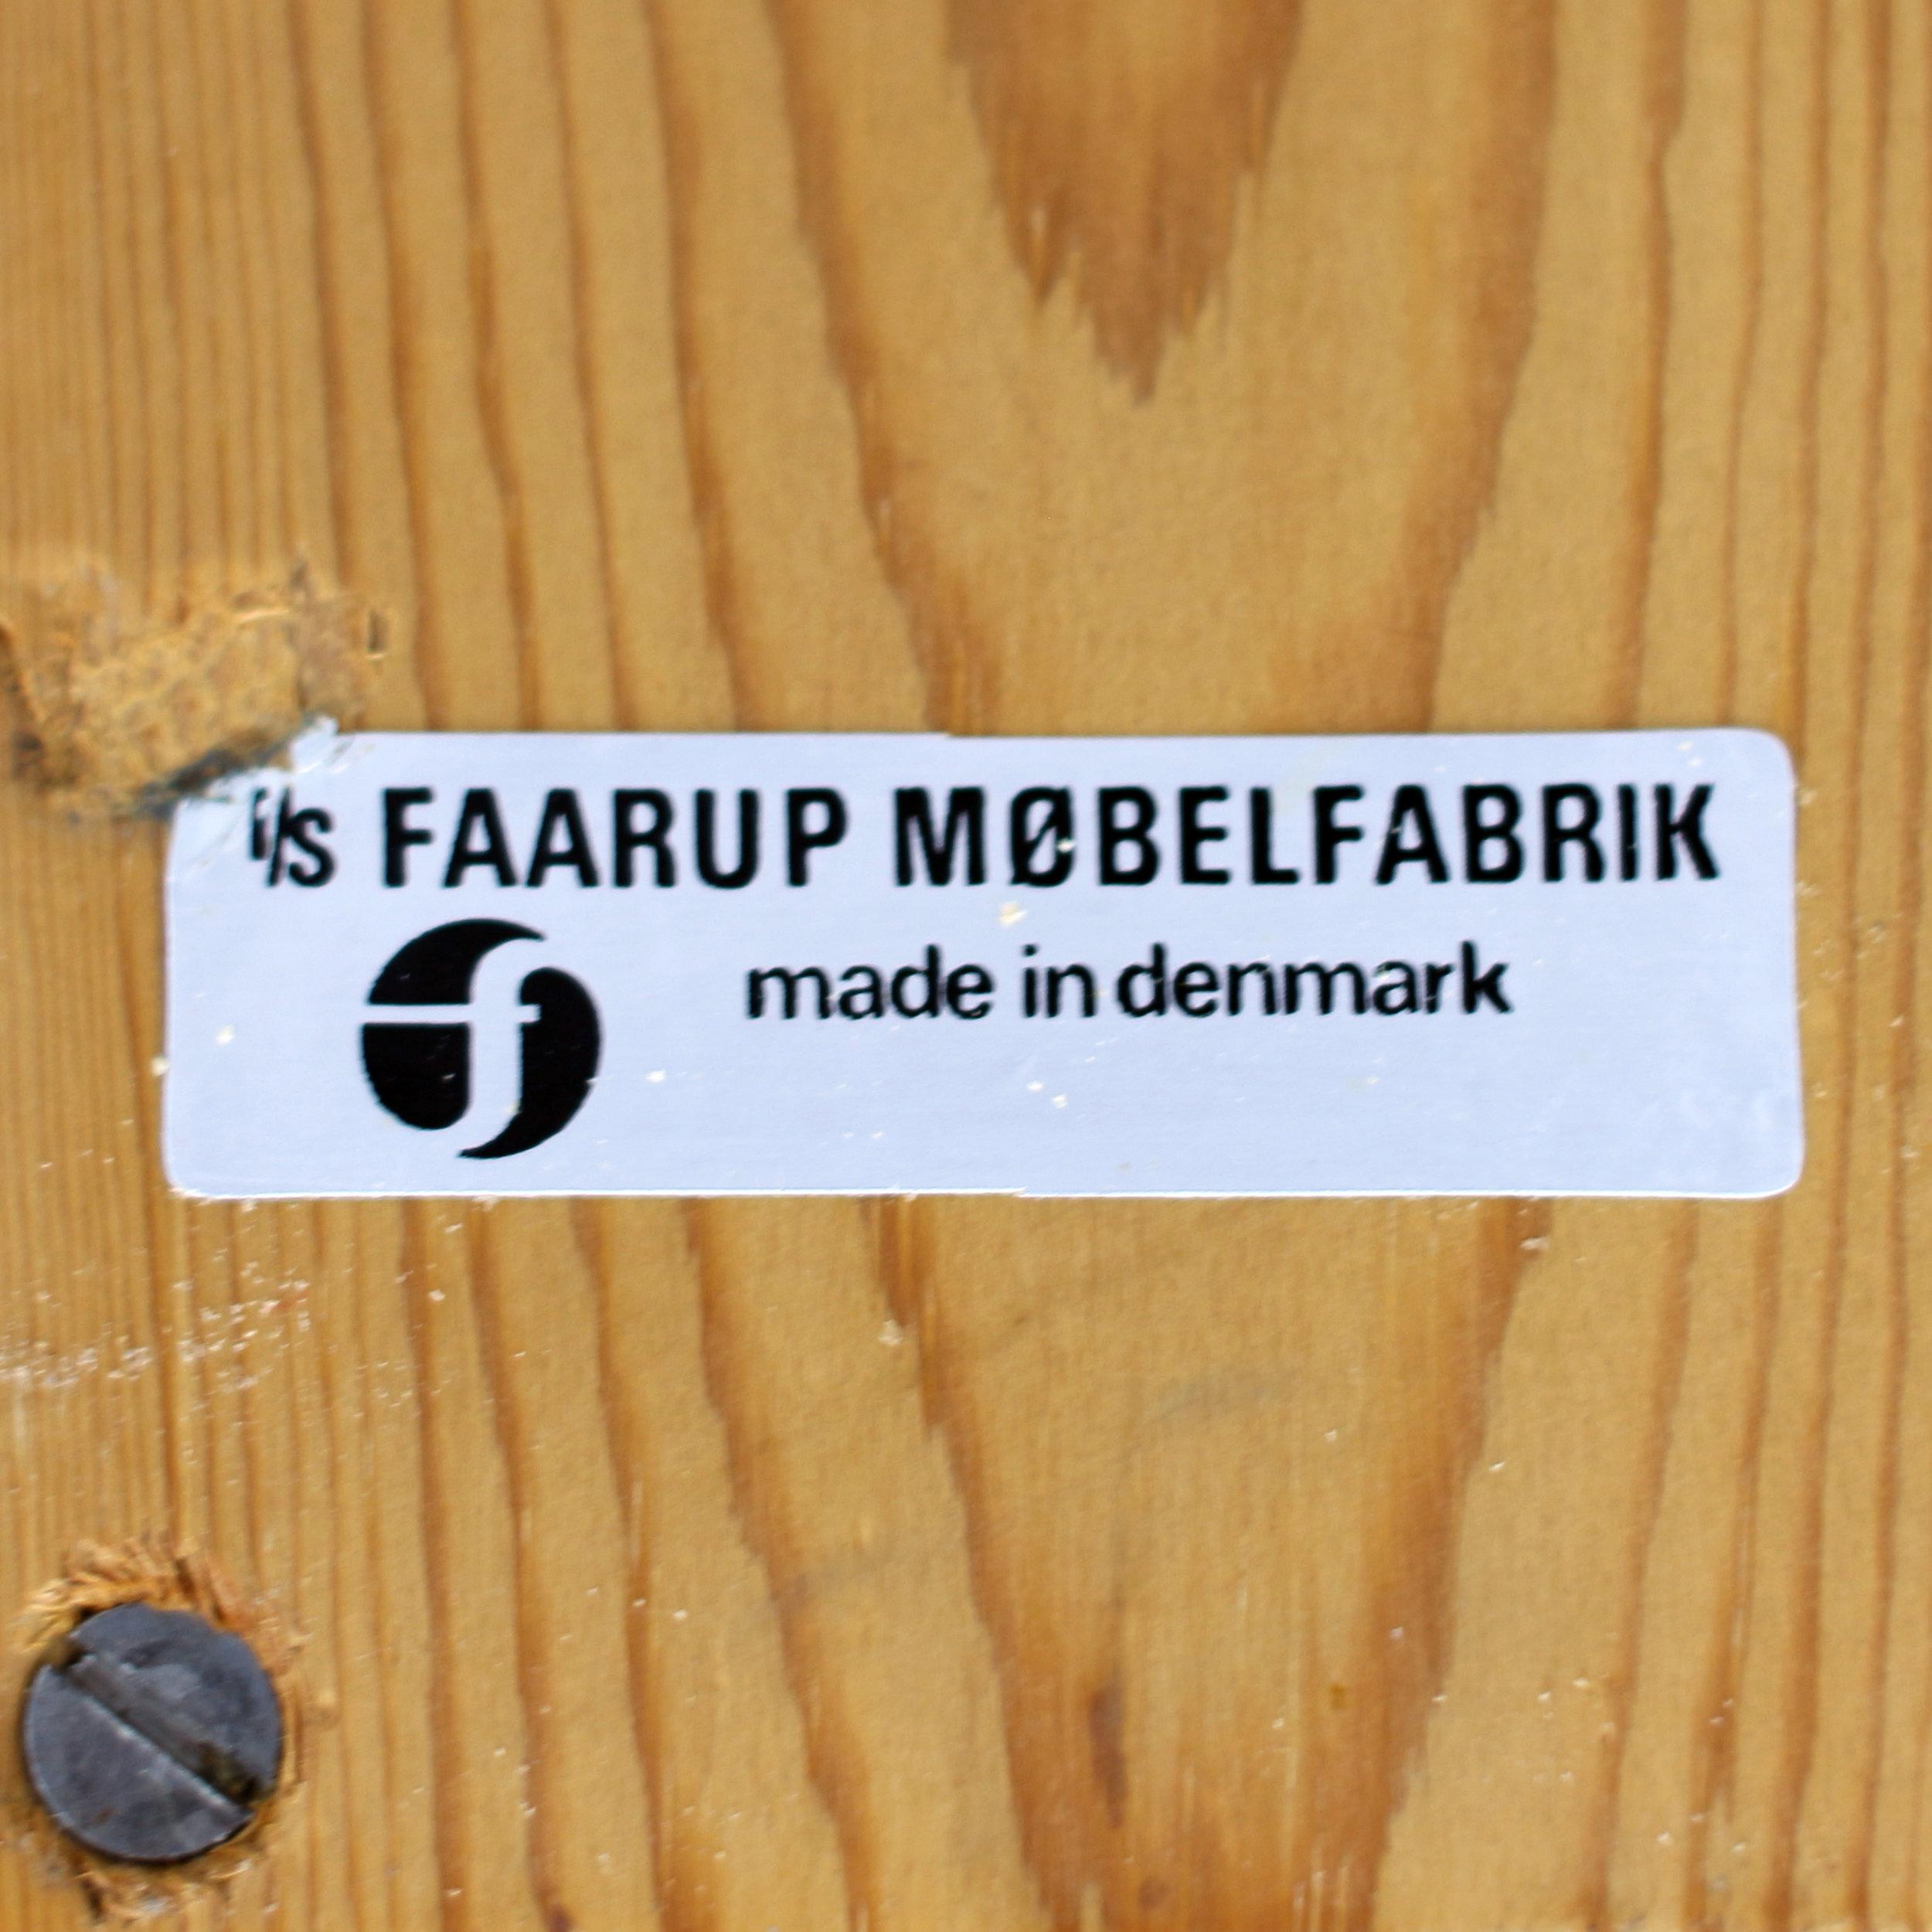 Faarup-Mobelfabrik-logo- ib-kofod-larsen-teak-dining-table.jpg